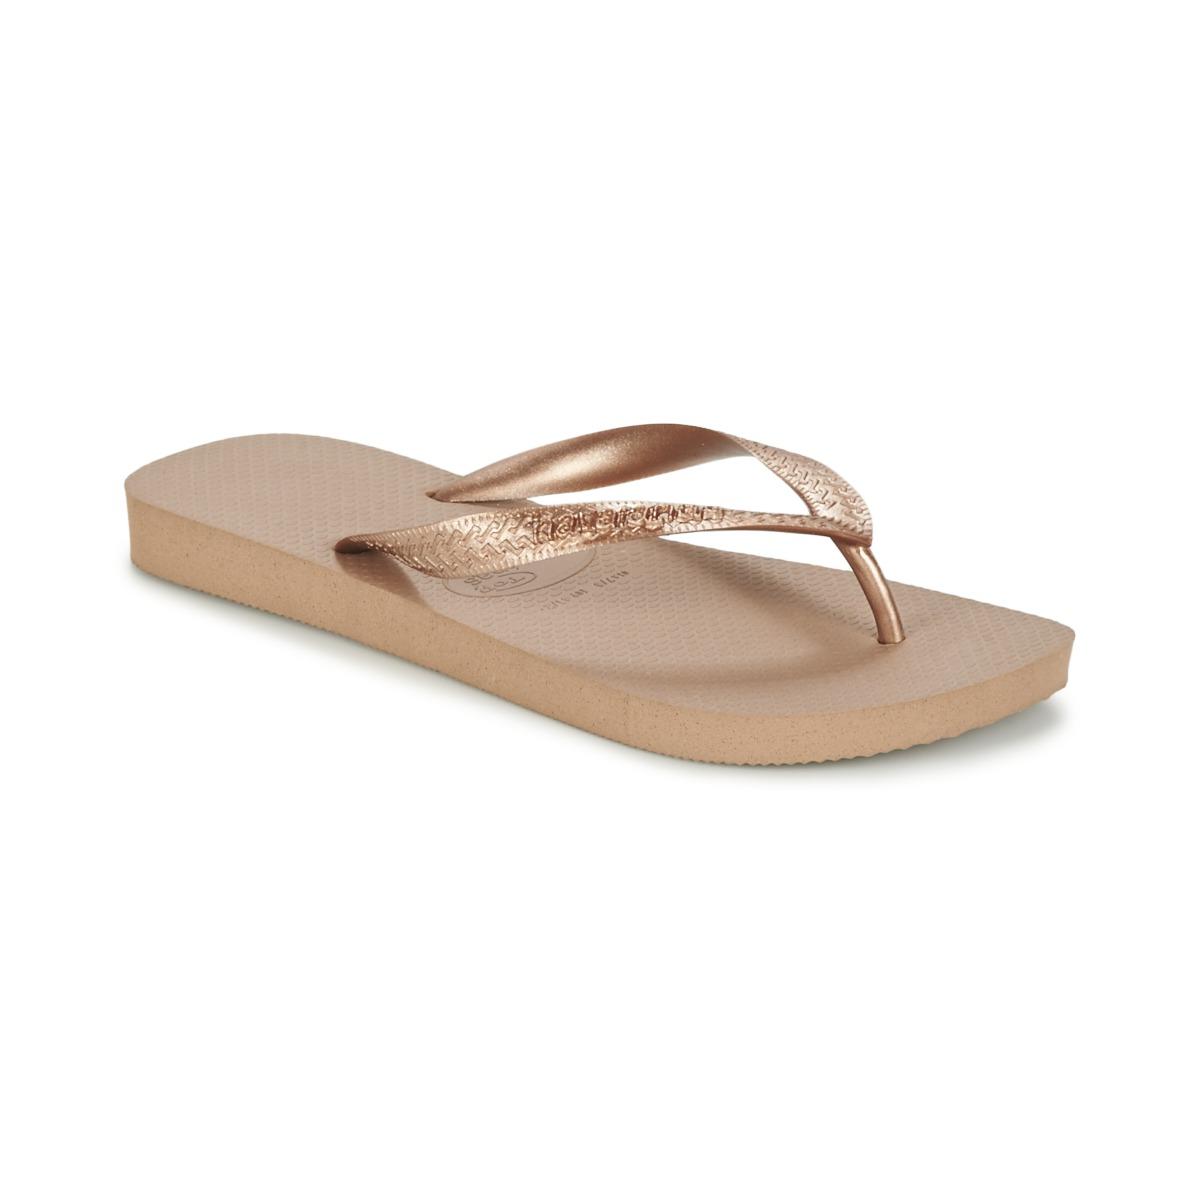 Havaianas TOP METALLIC Rose / Gold - Kostenloser Versand bei Spartoode ! - Schuhe Zehensandalen Damen 19,99 €